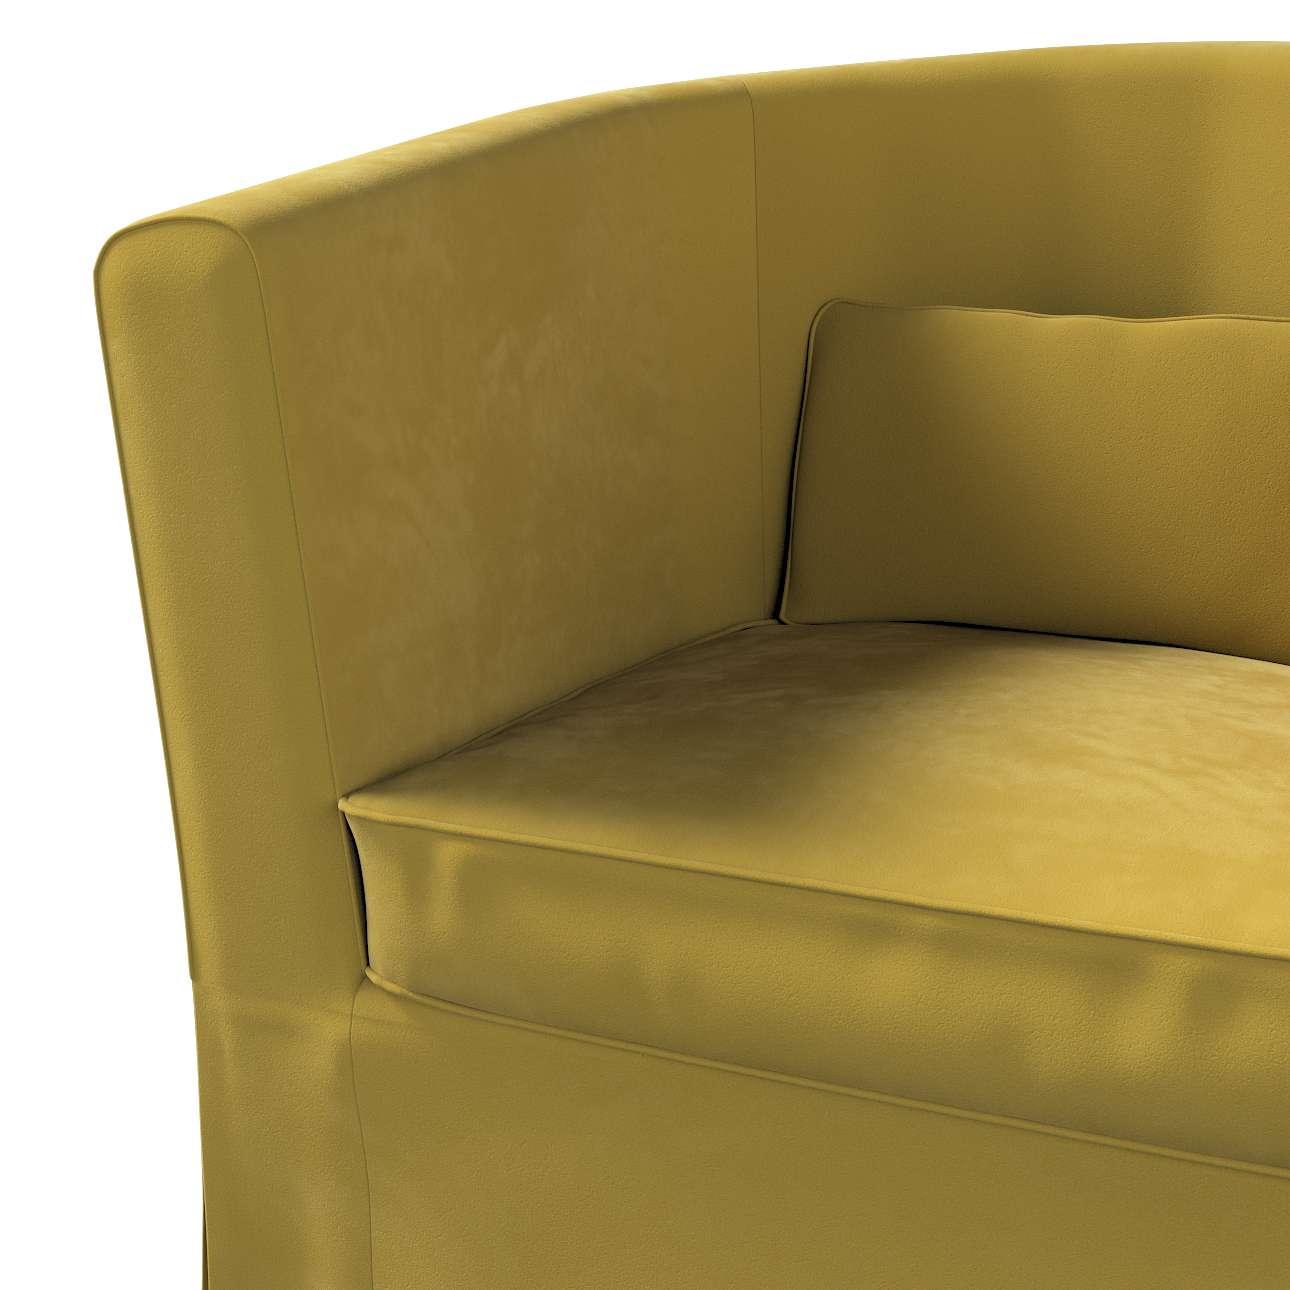 Pokrowiec na fotel Ektorp Tullsta w kolekcji Velvet, tkanina: 704-27